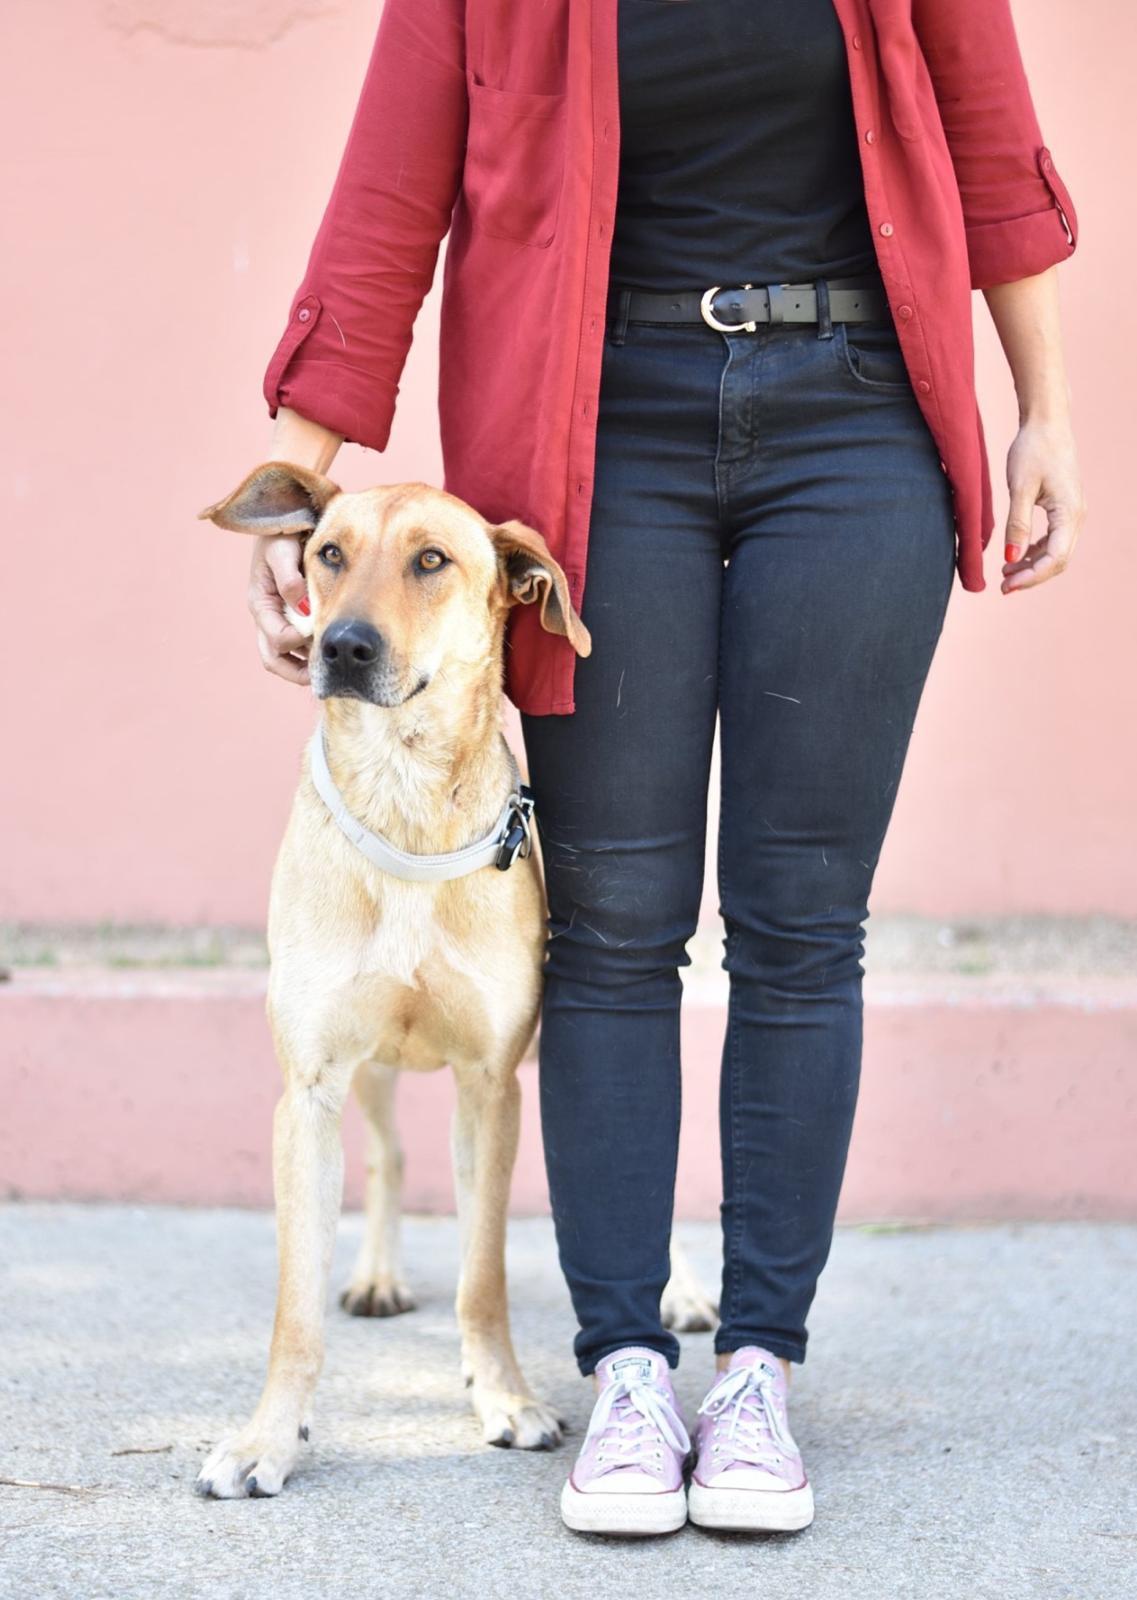 Gos en Adopció